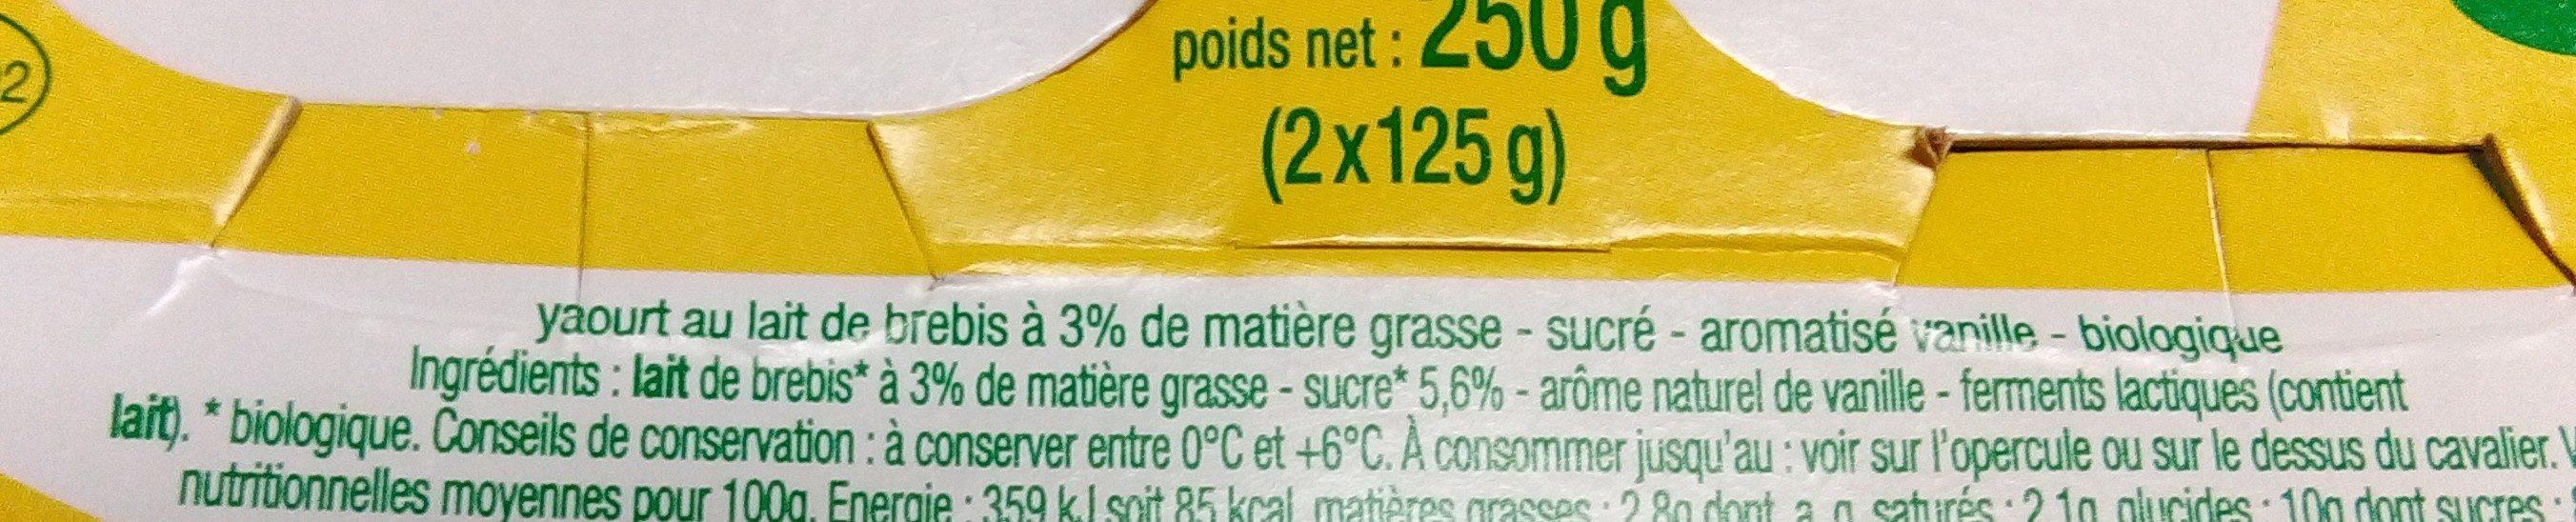 Yaourt de brebis vanille bio - Ingredients